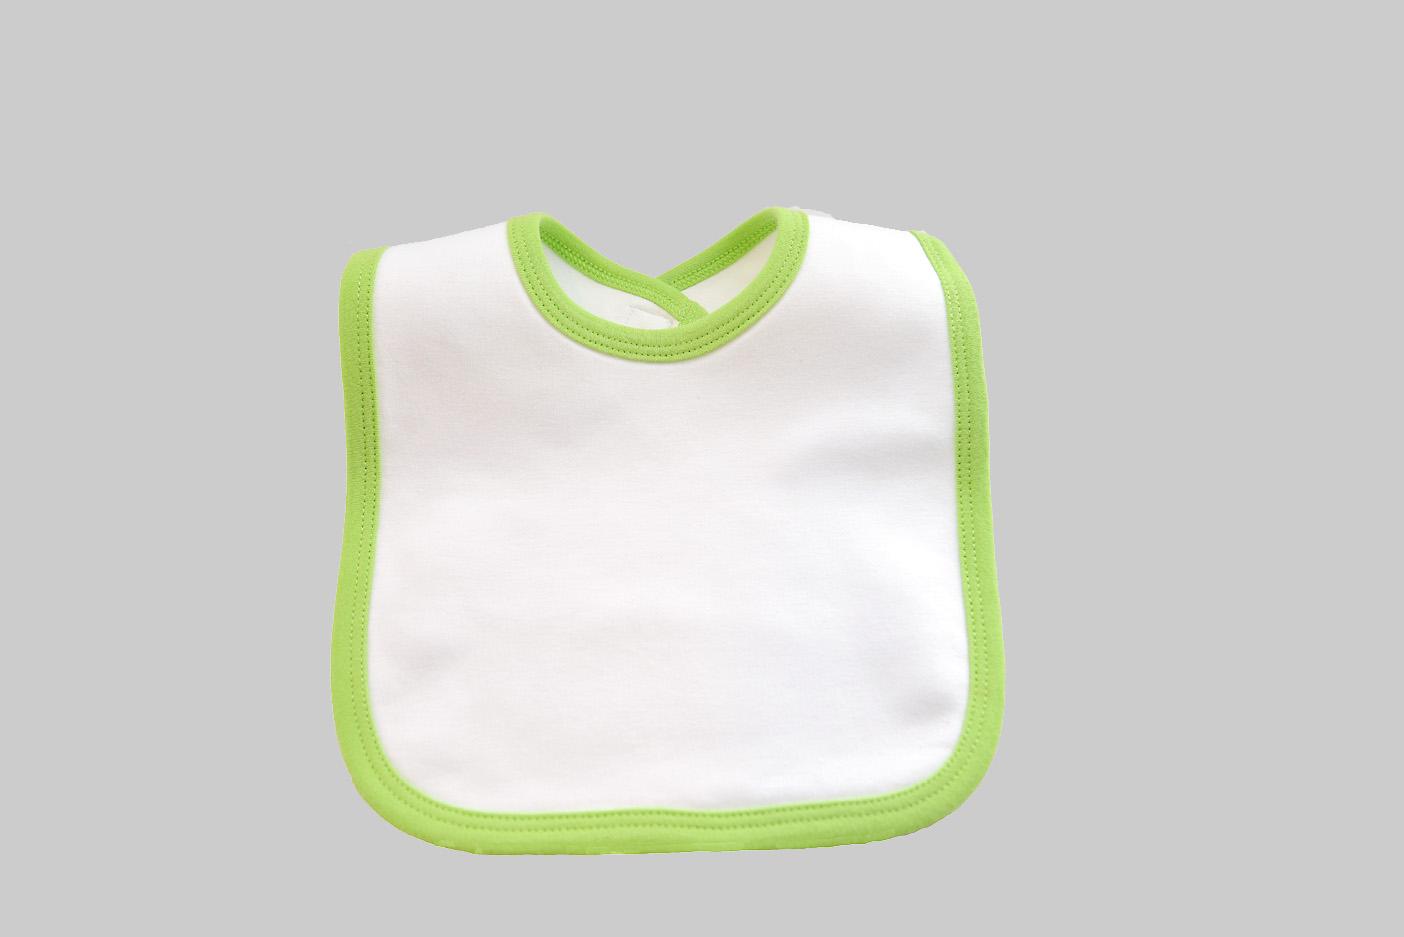 White & Bright Lime Green Baby Bib